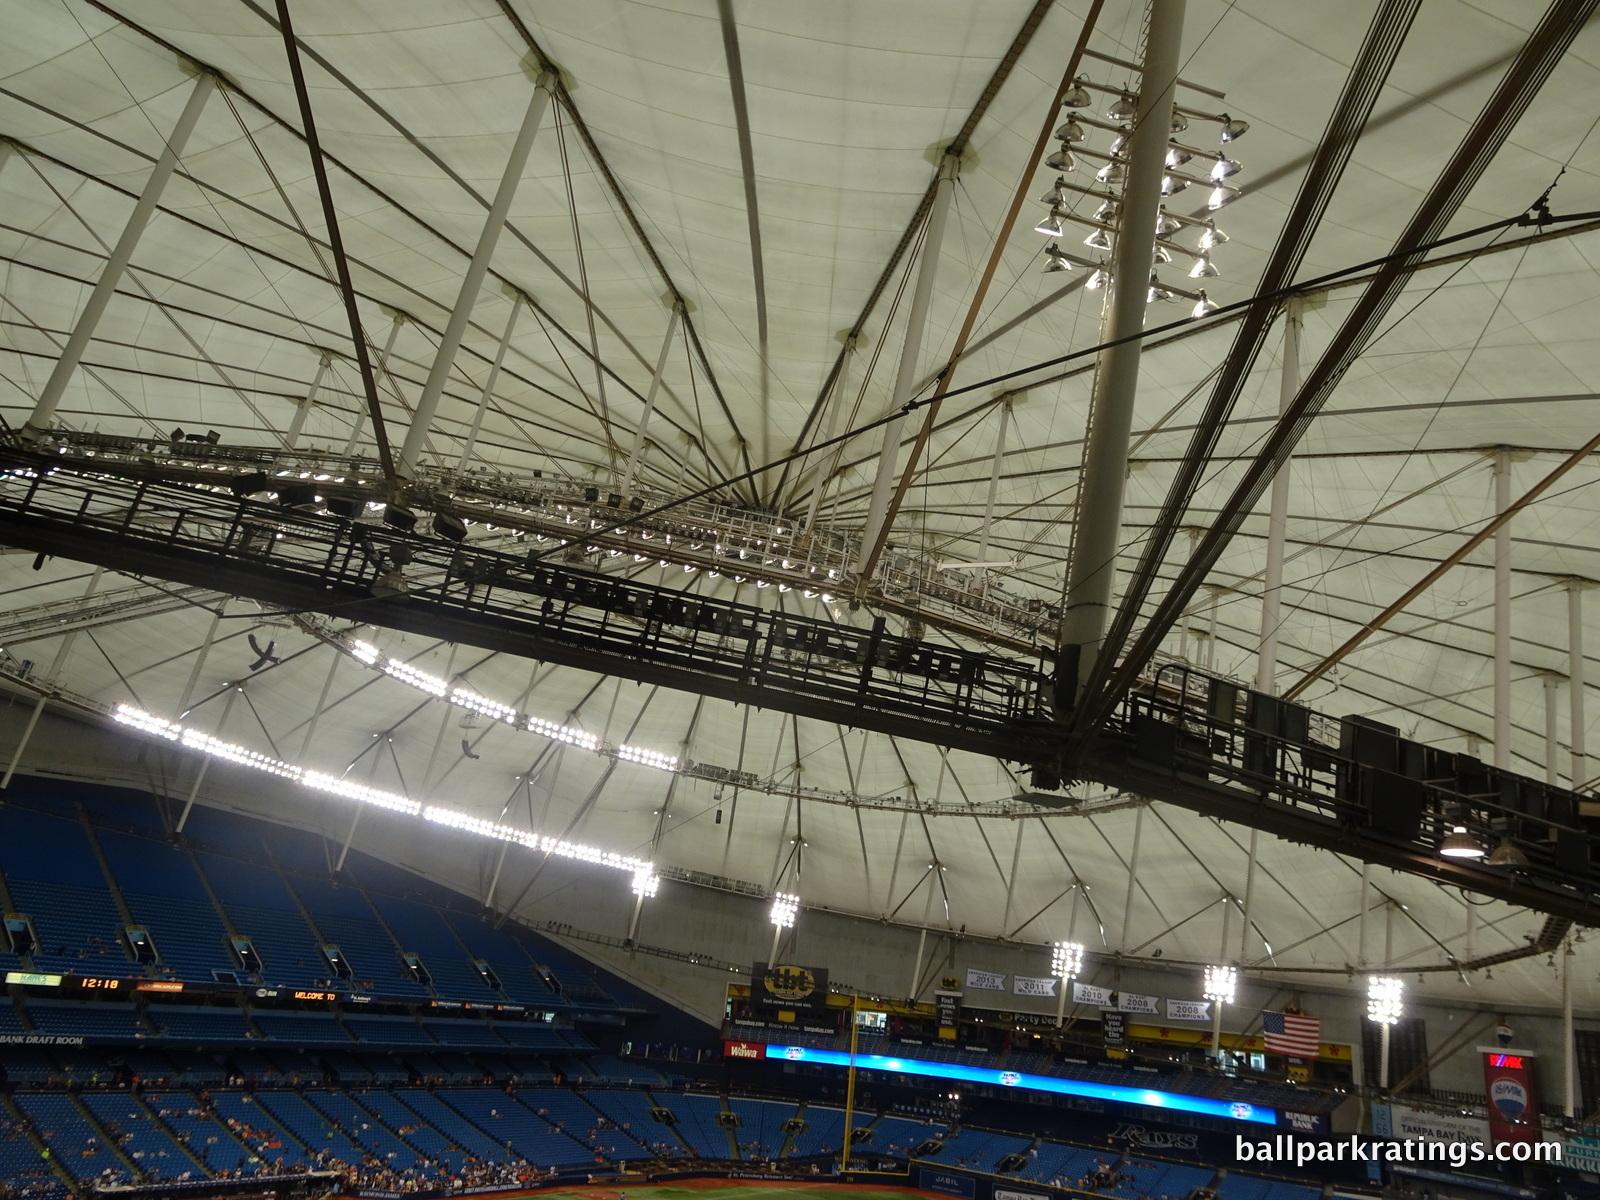 Tropicana Field catwalks slanted roof